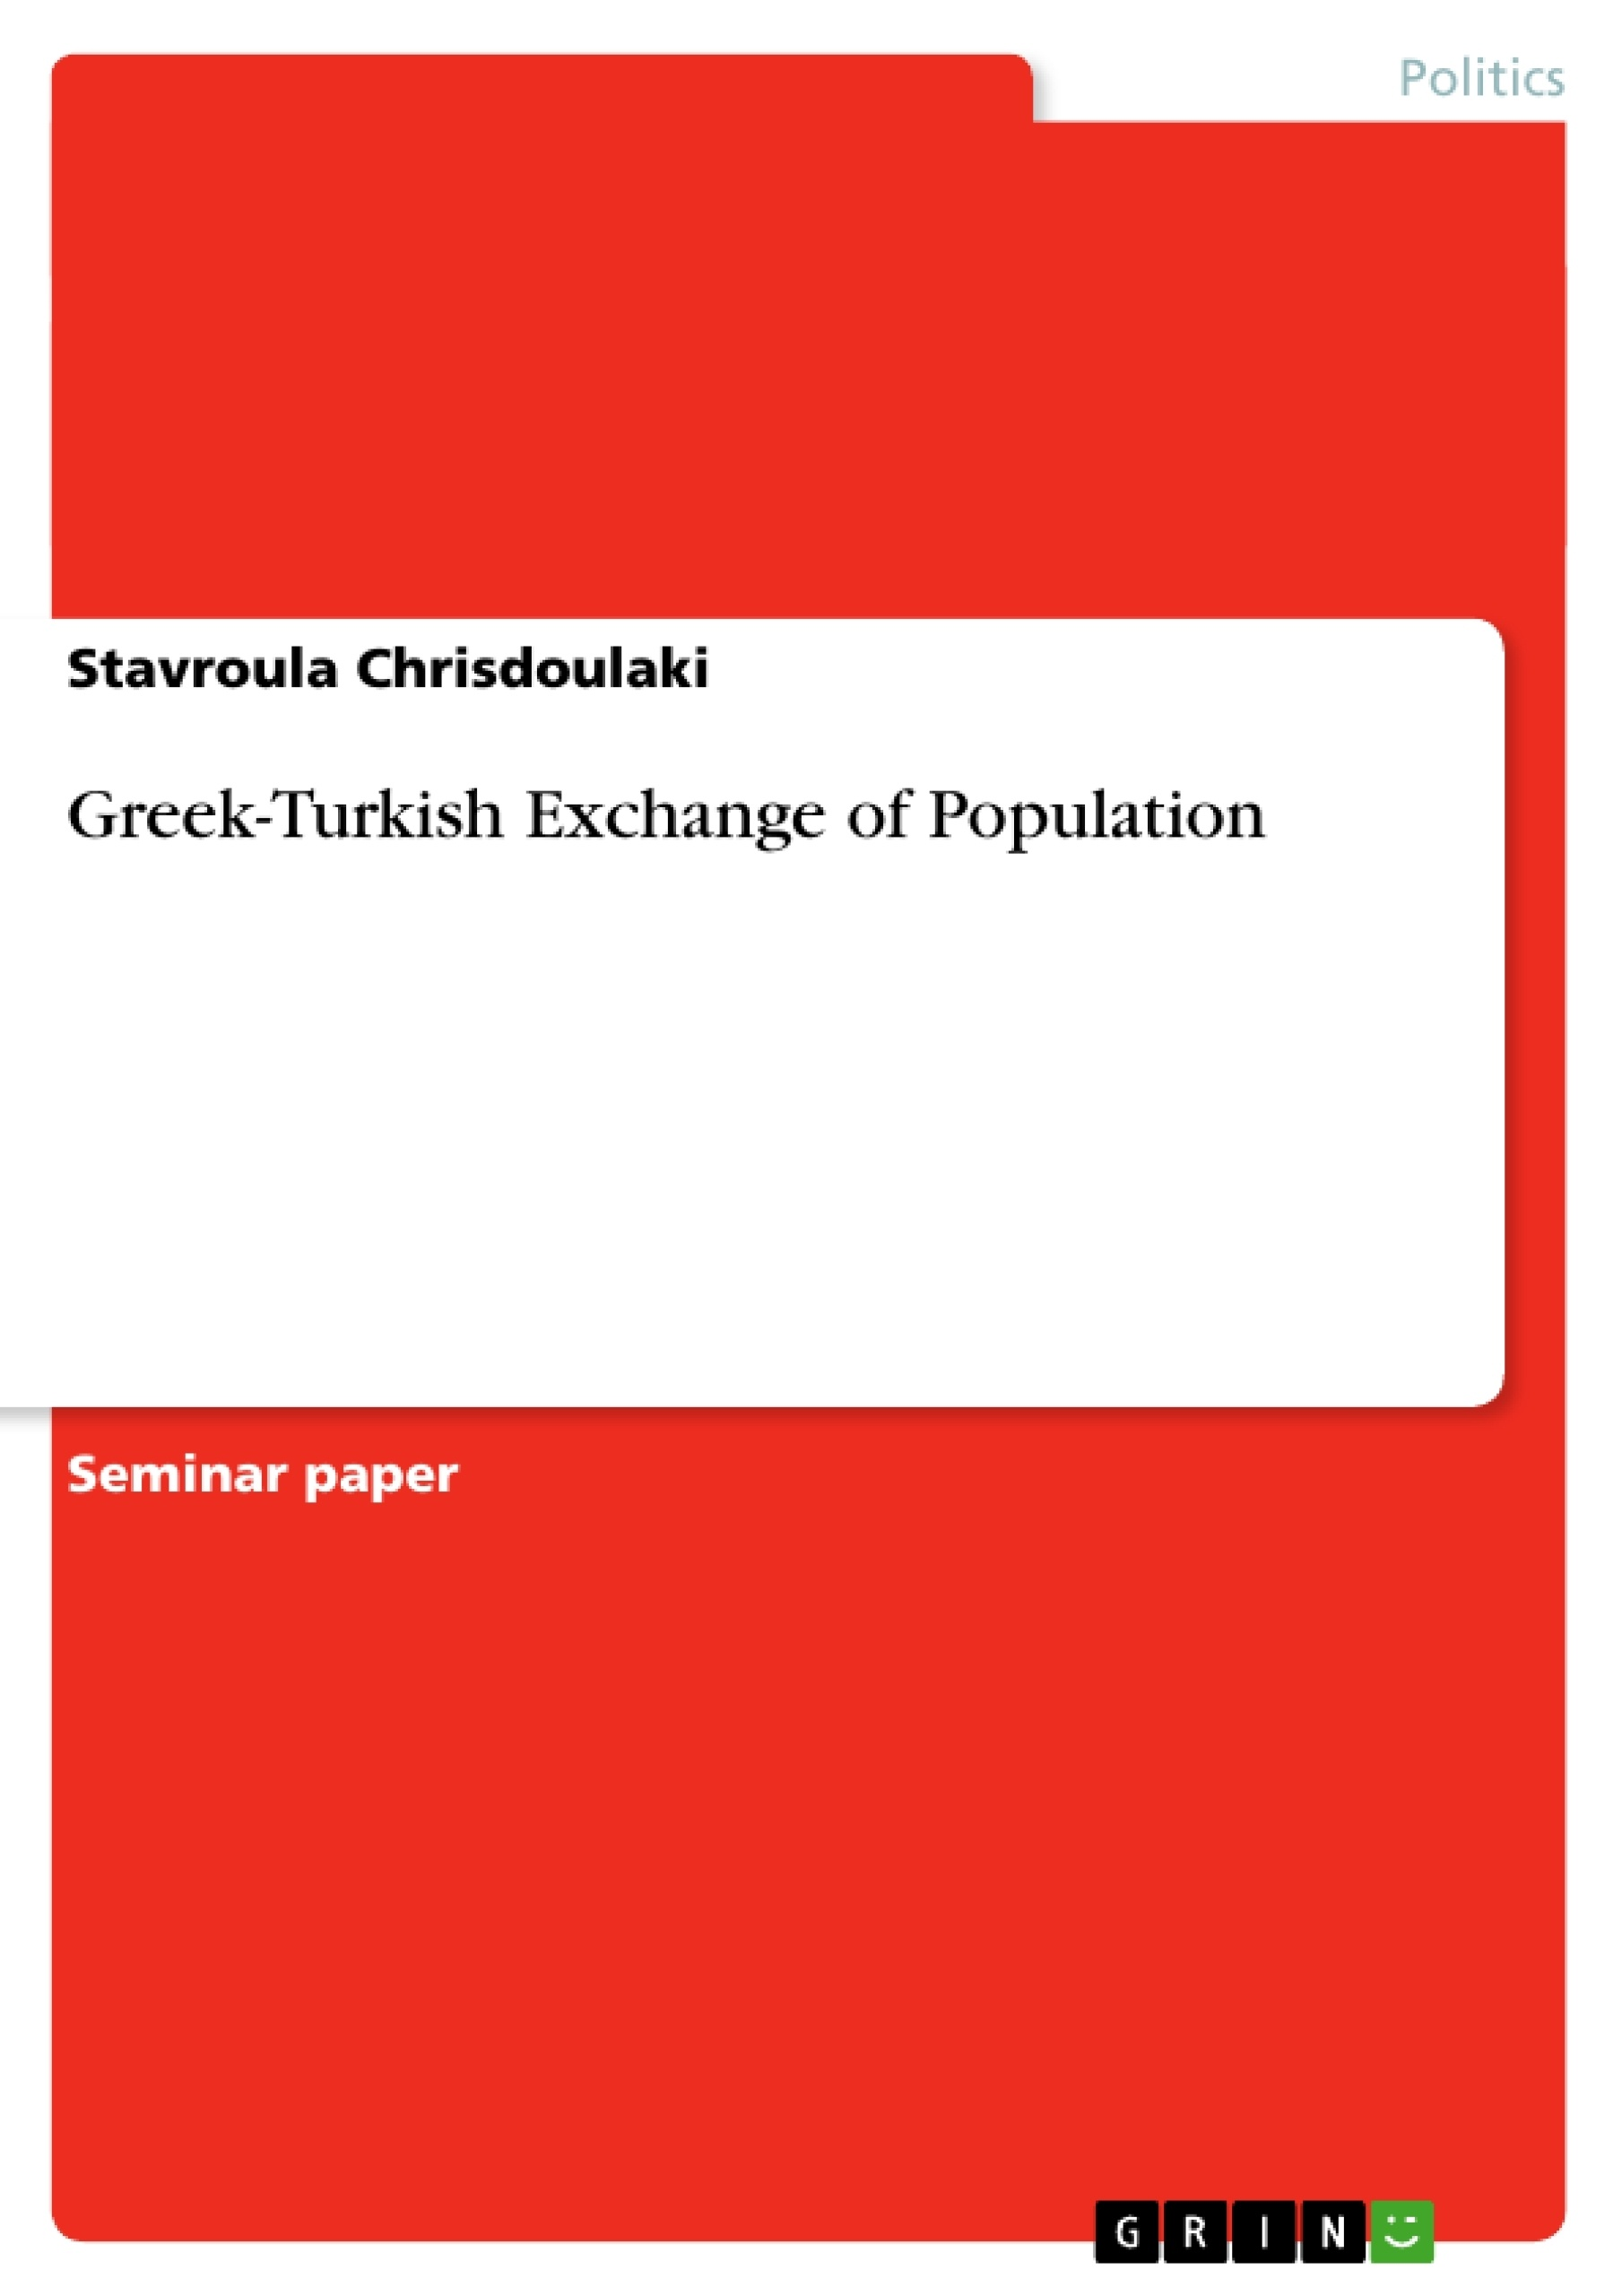 Title: Greek-Turkish Exchange of Population